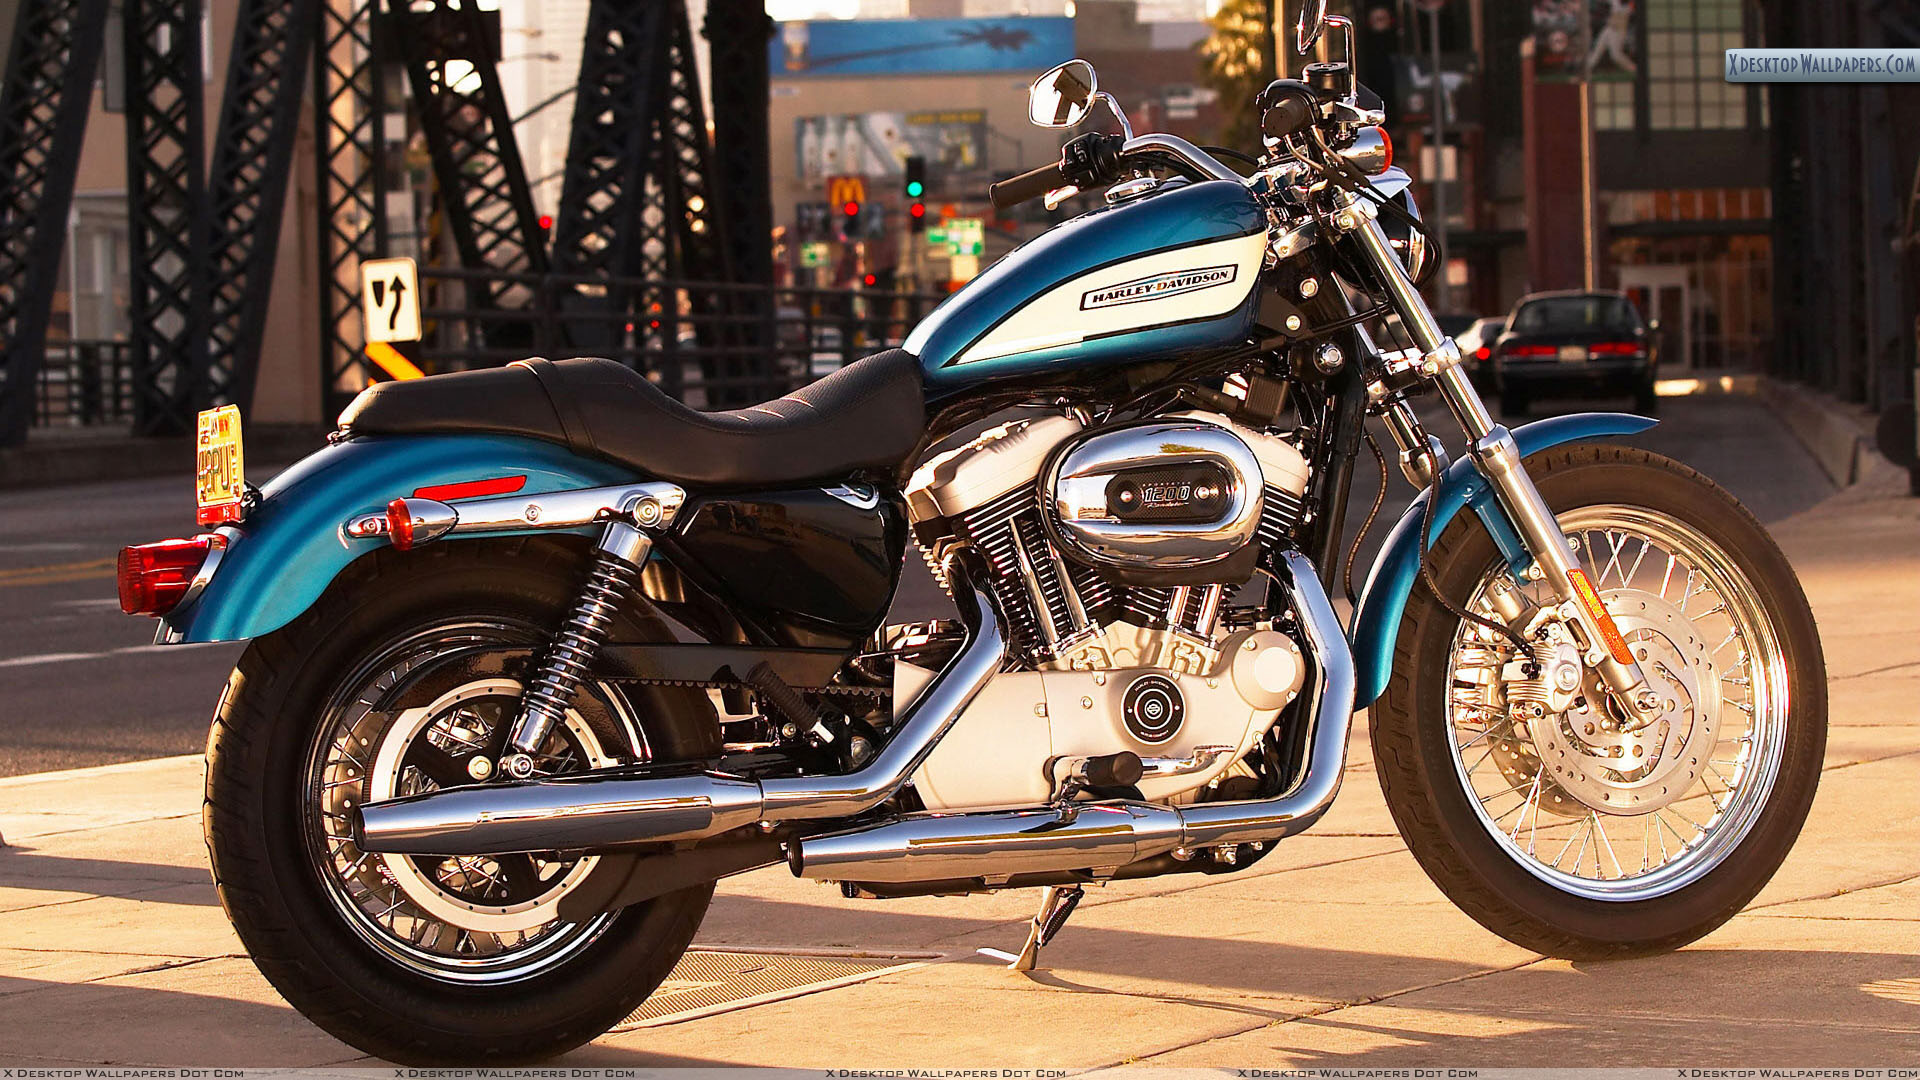 2007 Harley Davidson XL1200R Sportster Wallpaper 1920x1080